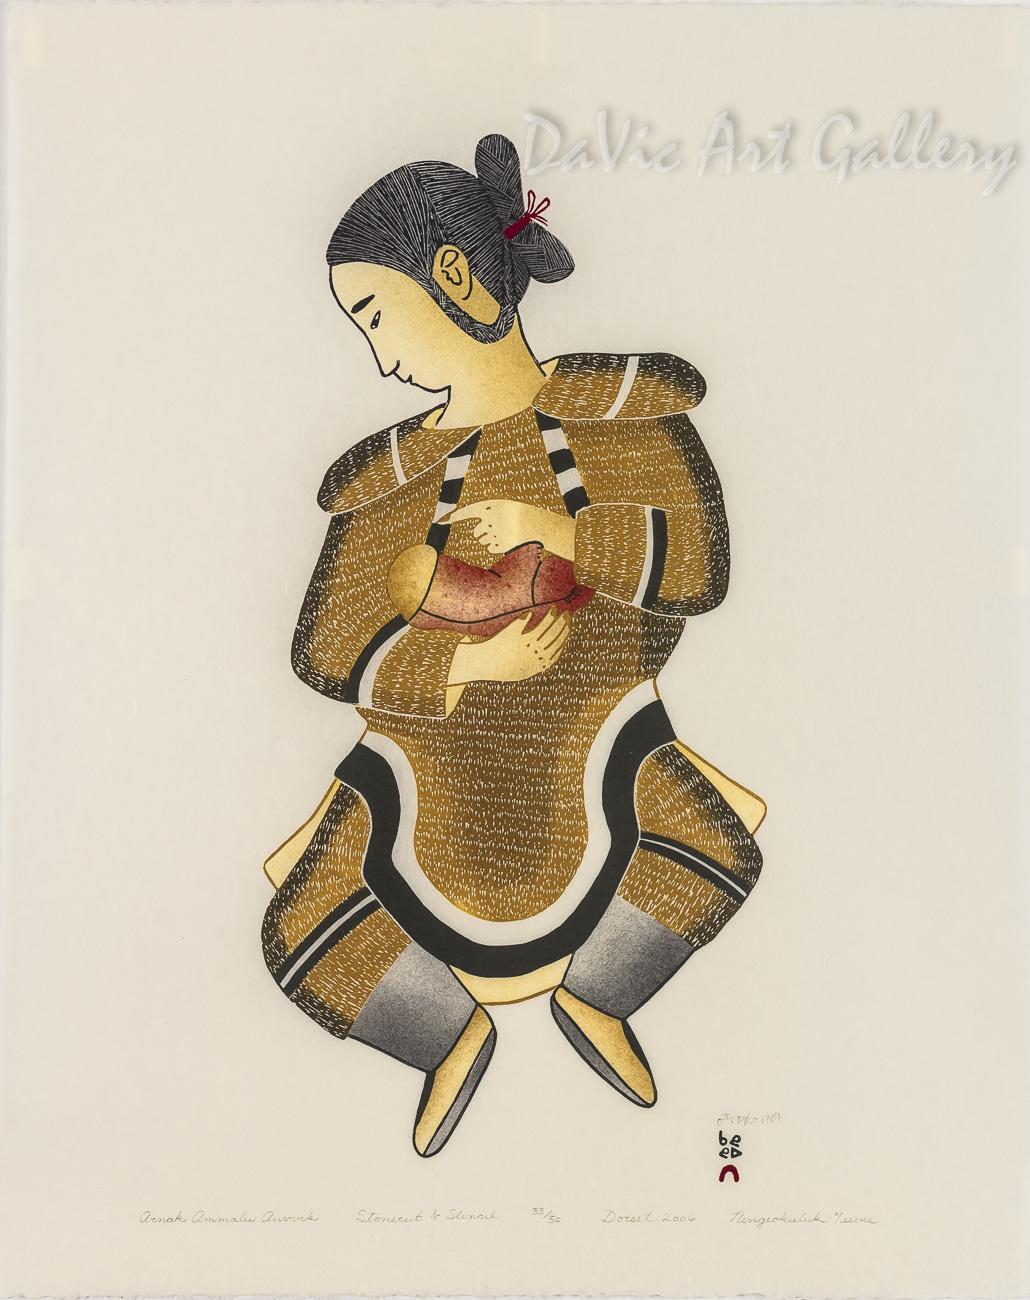 """Arnak Ammalu Auvvik (The Woman and The Caterpillar)"" by Ningeokuluk Teevee - Cape Dorset 2009"